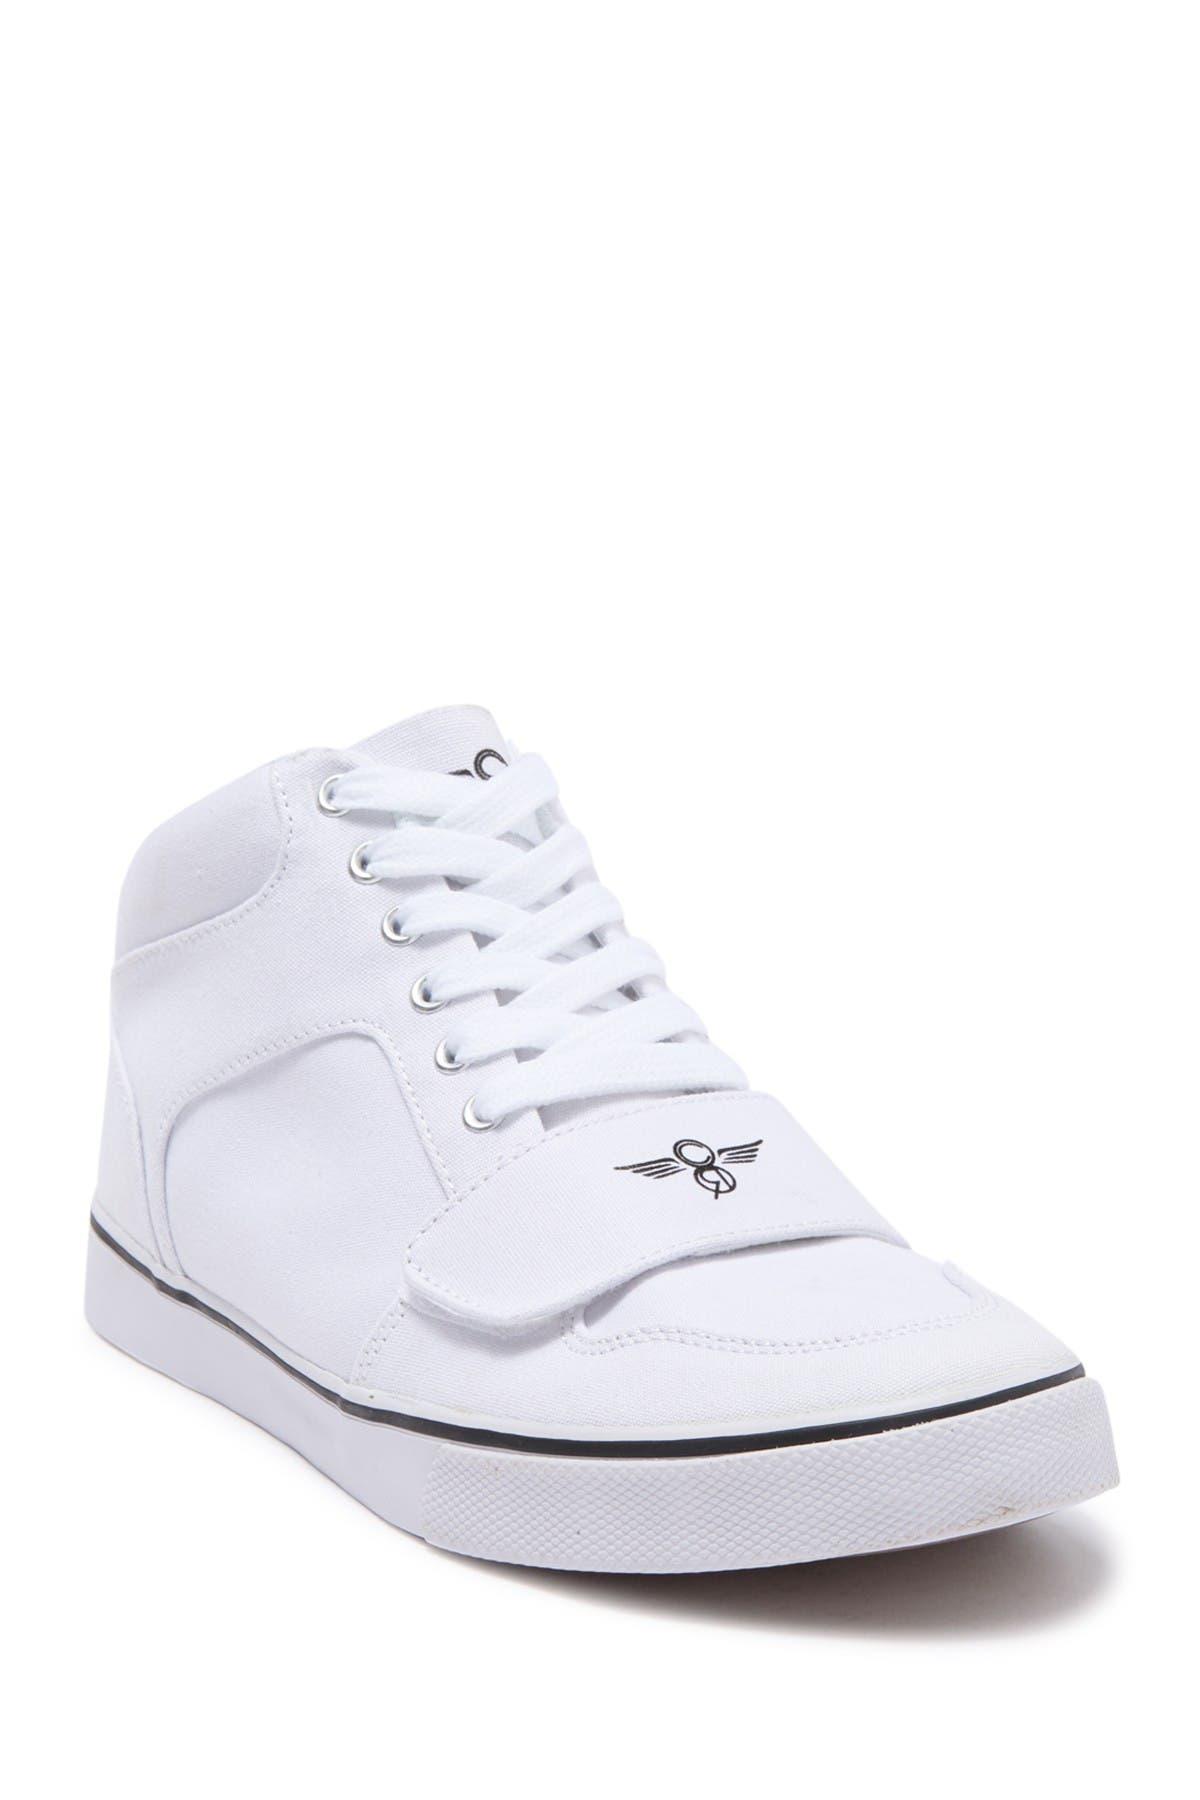 Image of Creative Recreation Cesario Mid Canvas Sneaker